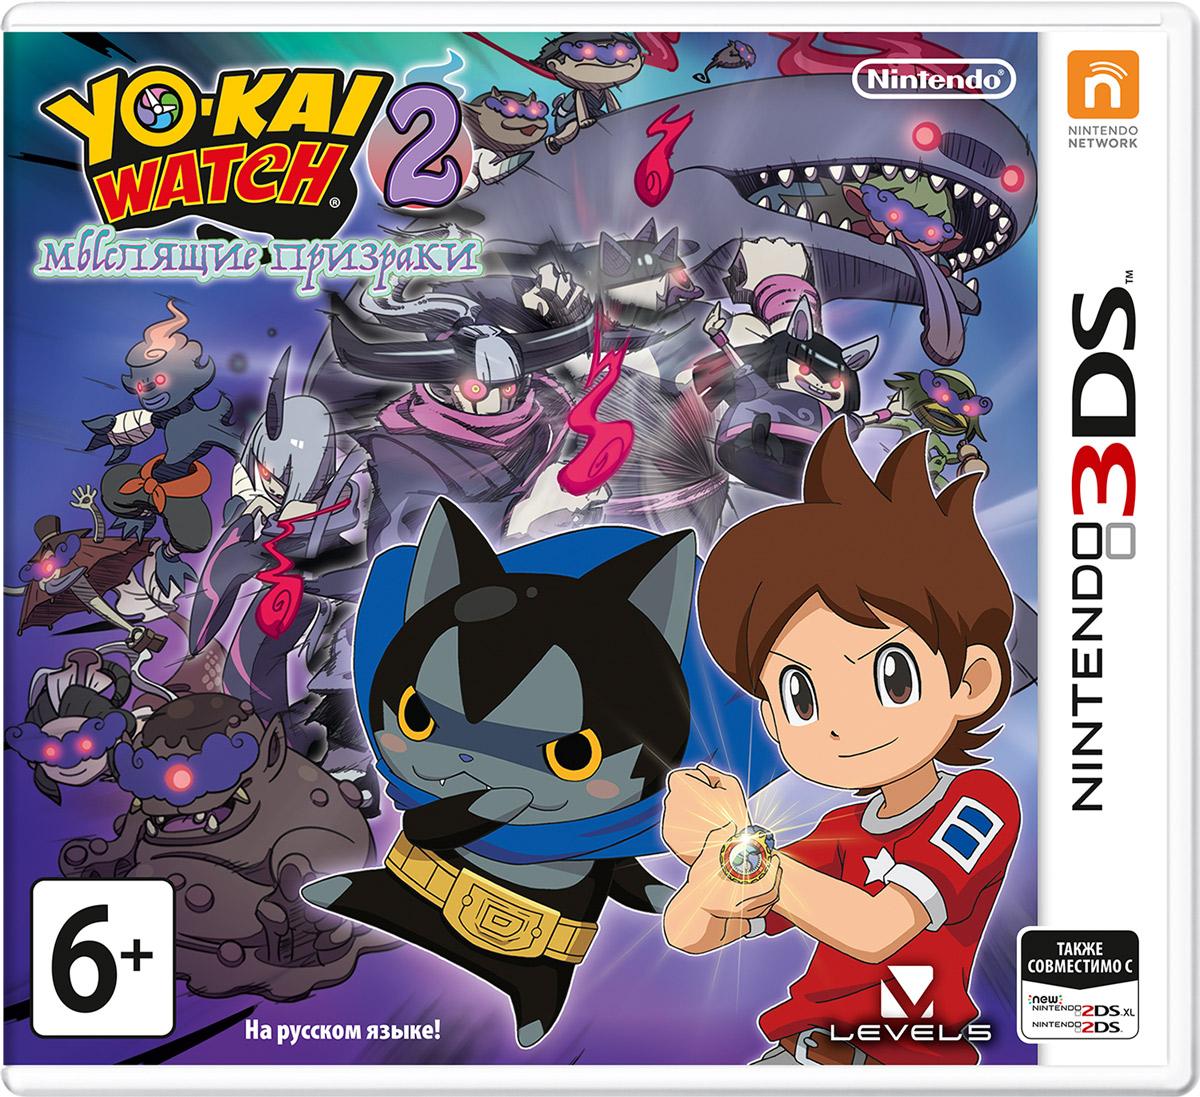 YO-KAI WATCH 2: Мыслящие призраки (3DS)